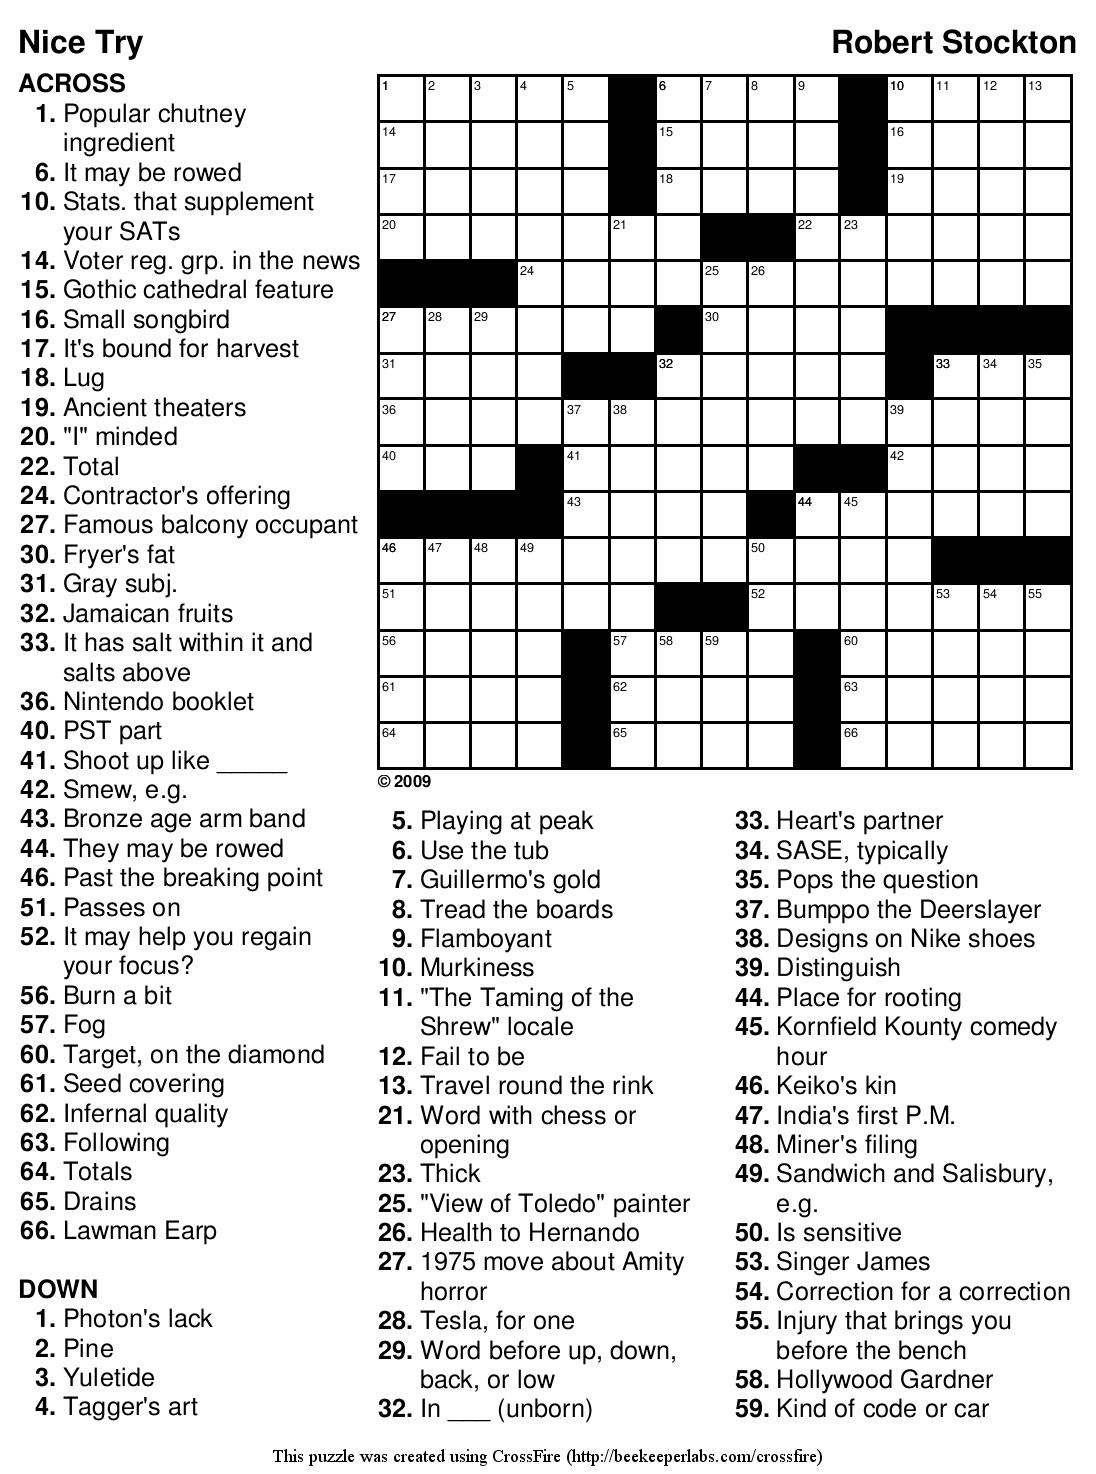 Beekeeper Crosswords Blog Archive Puzzle 126 Nice Try